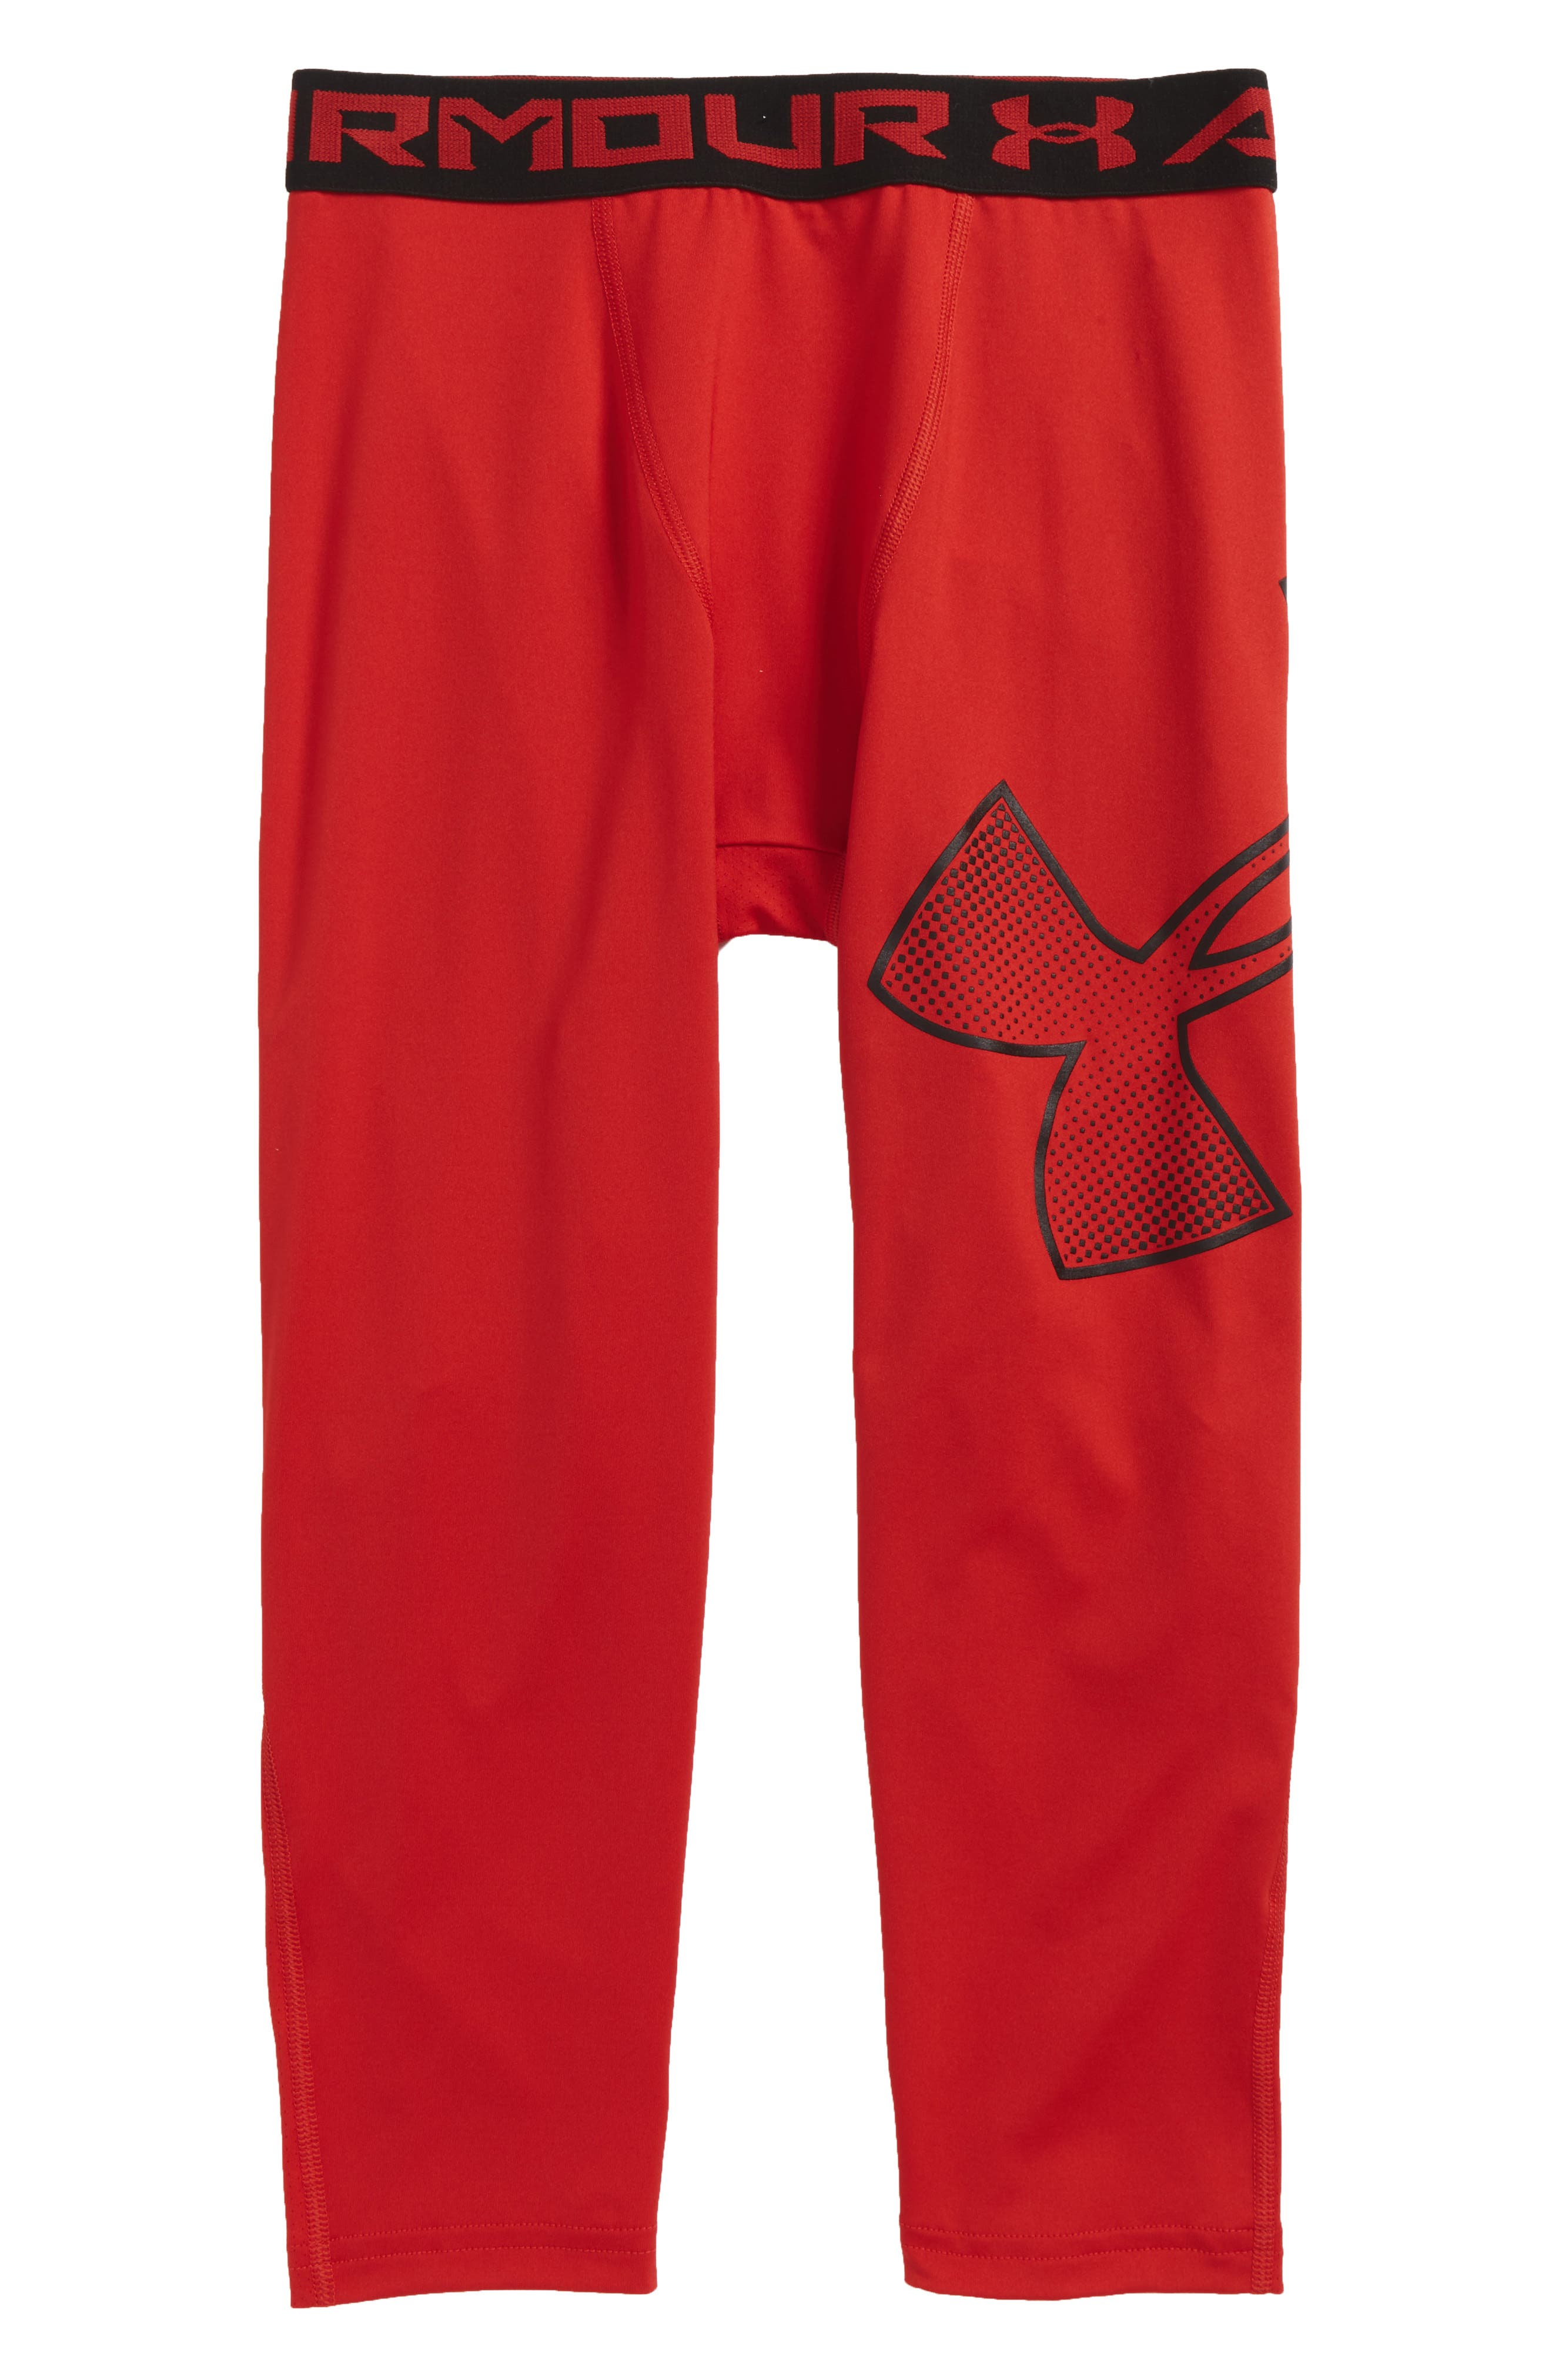 Alternate Image 1 Selected - Under Armour Logo HeatGear® 3/4 Leggings (Little Boys & Big Boys)